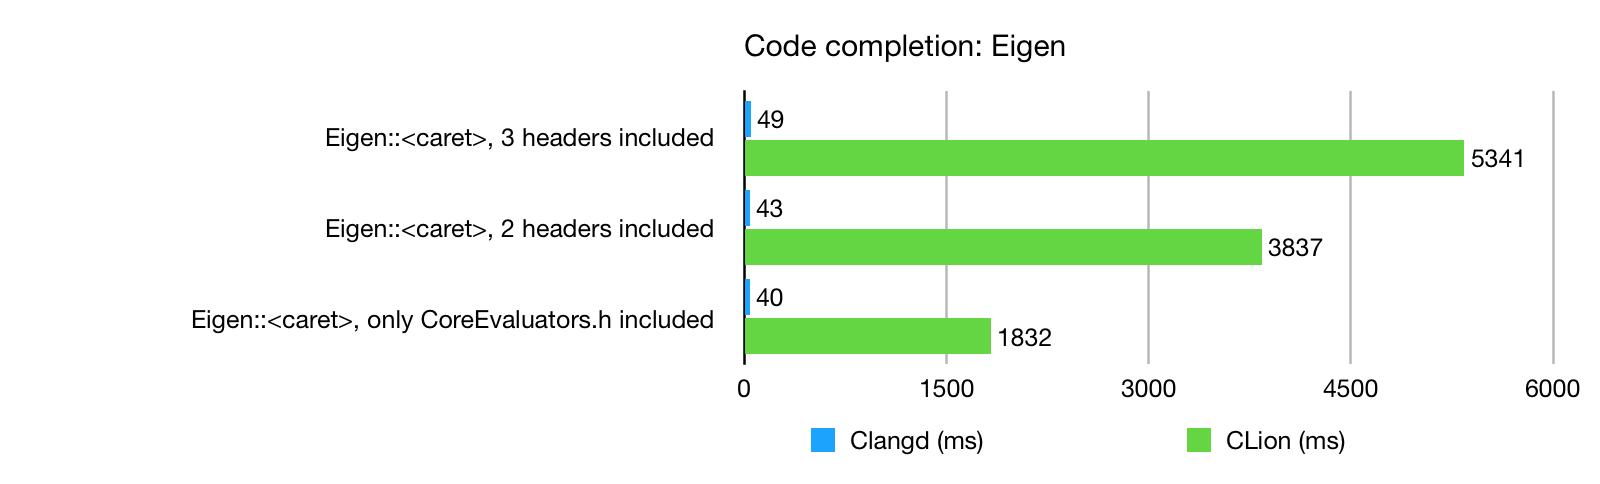 Code completion: Eigen